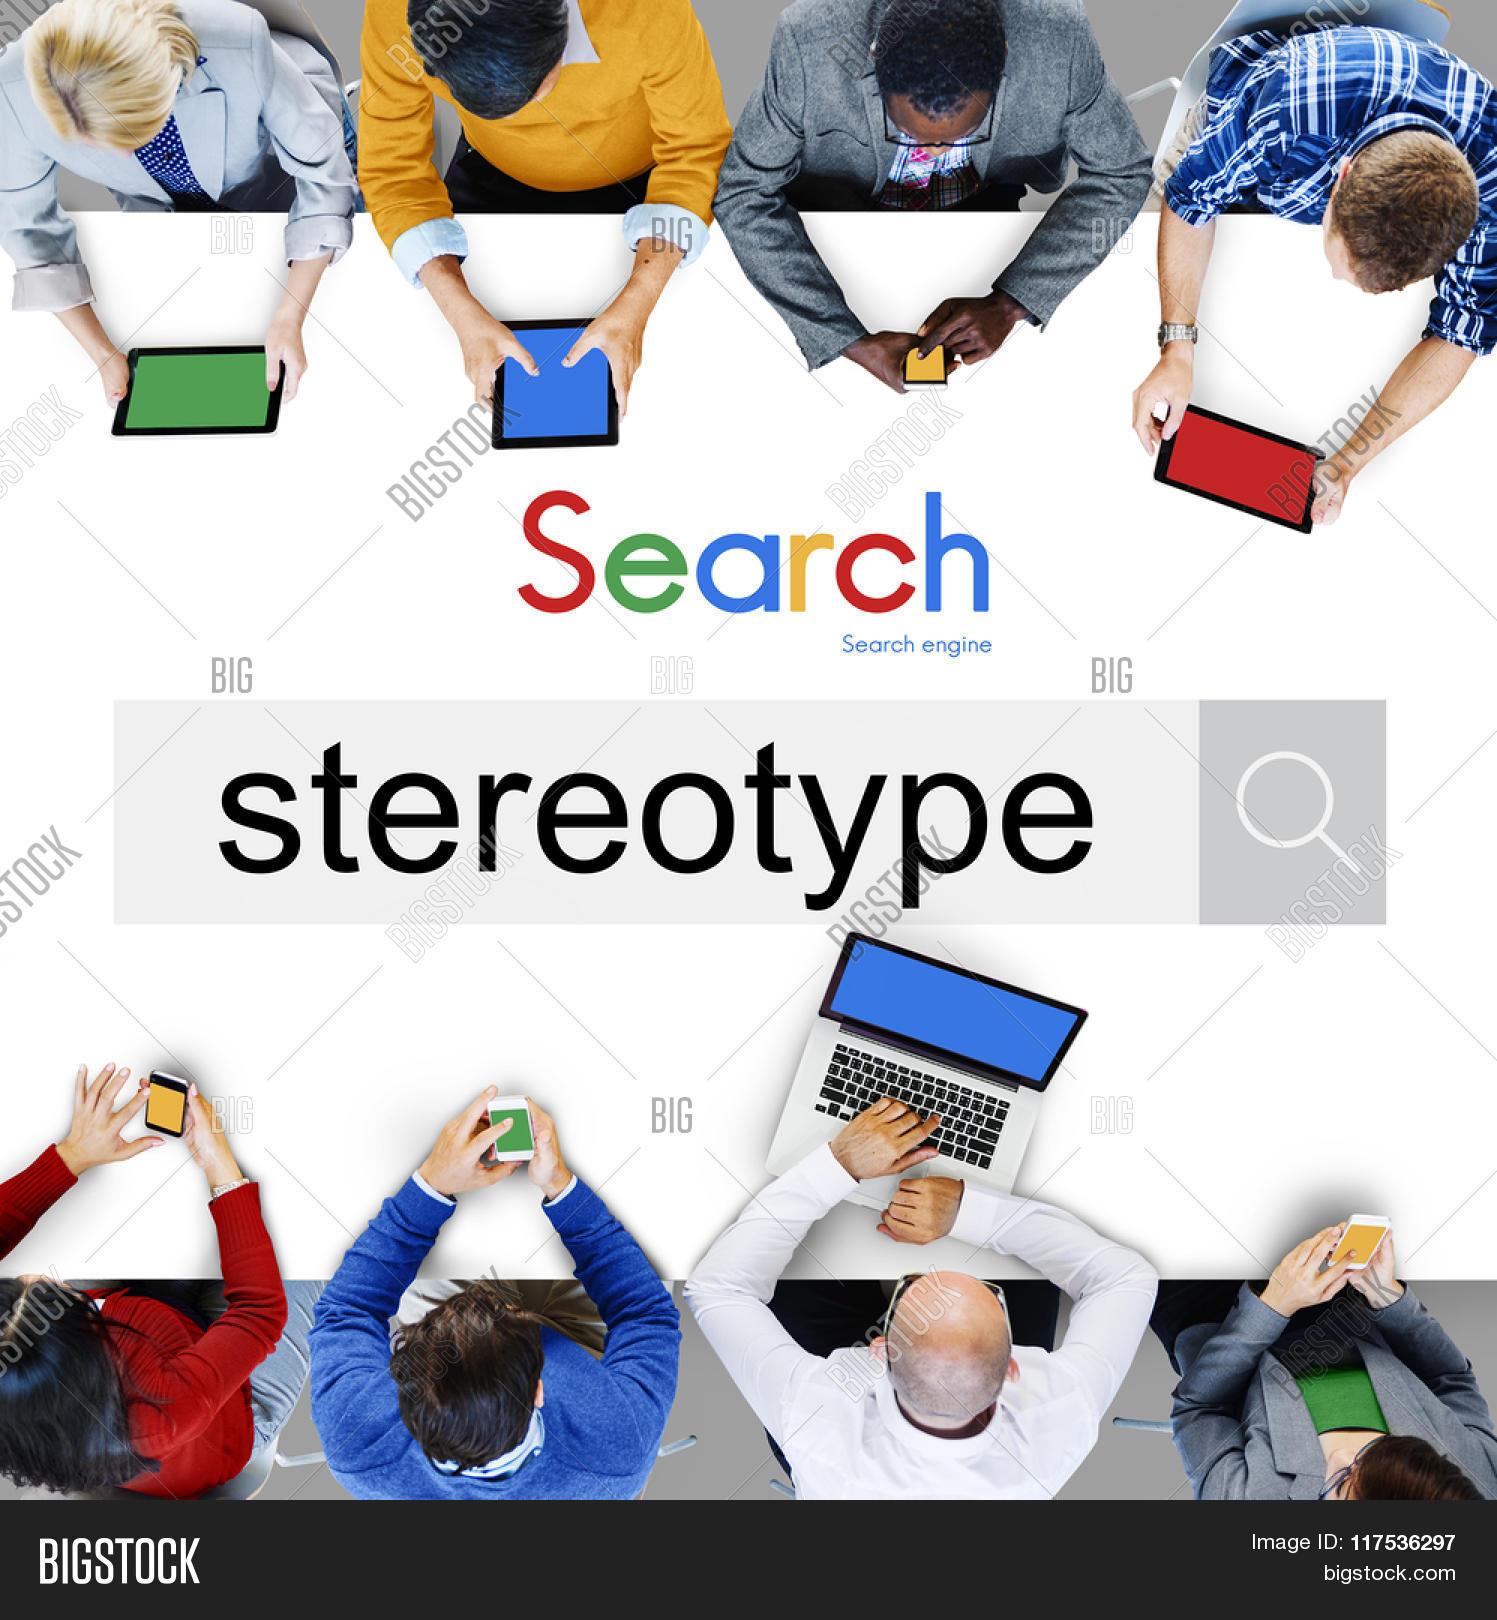 Stereotype Belief Bias Image Amp Photo Free Trial